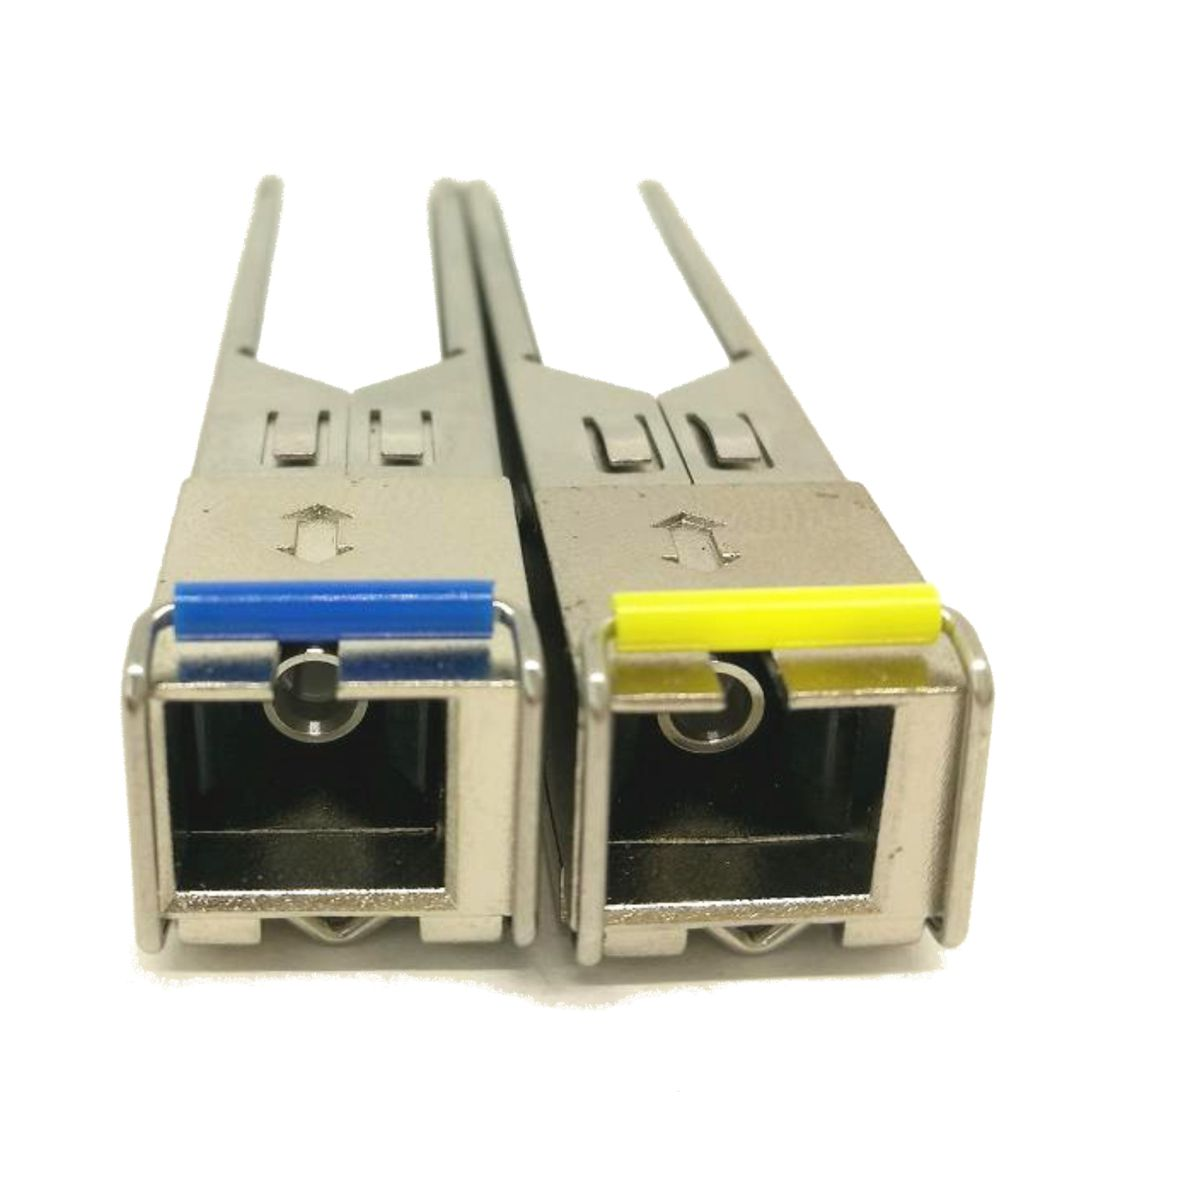 Módulo Óptico SFP (Mini GBIC) – Gigabit Ethernet – Monomodo – Simplex SC – 20Km (1310-1550) – FMP35-1SM20C-SC